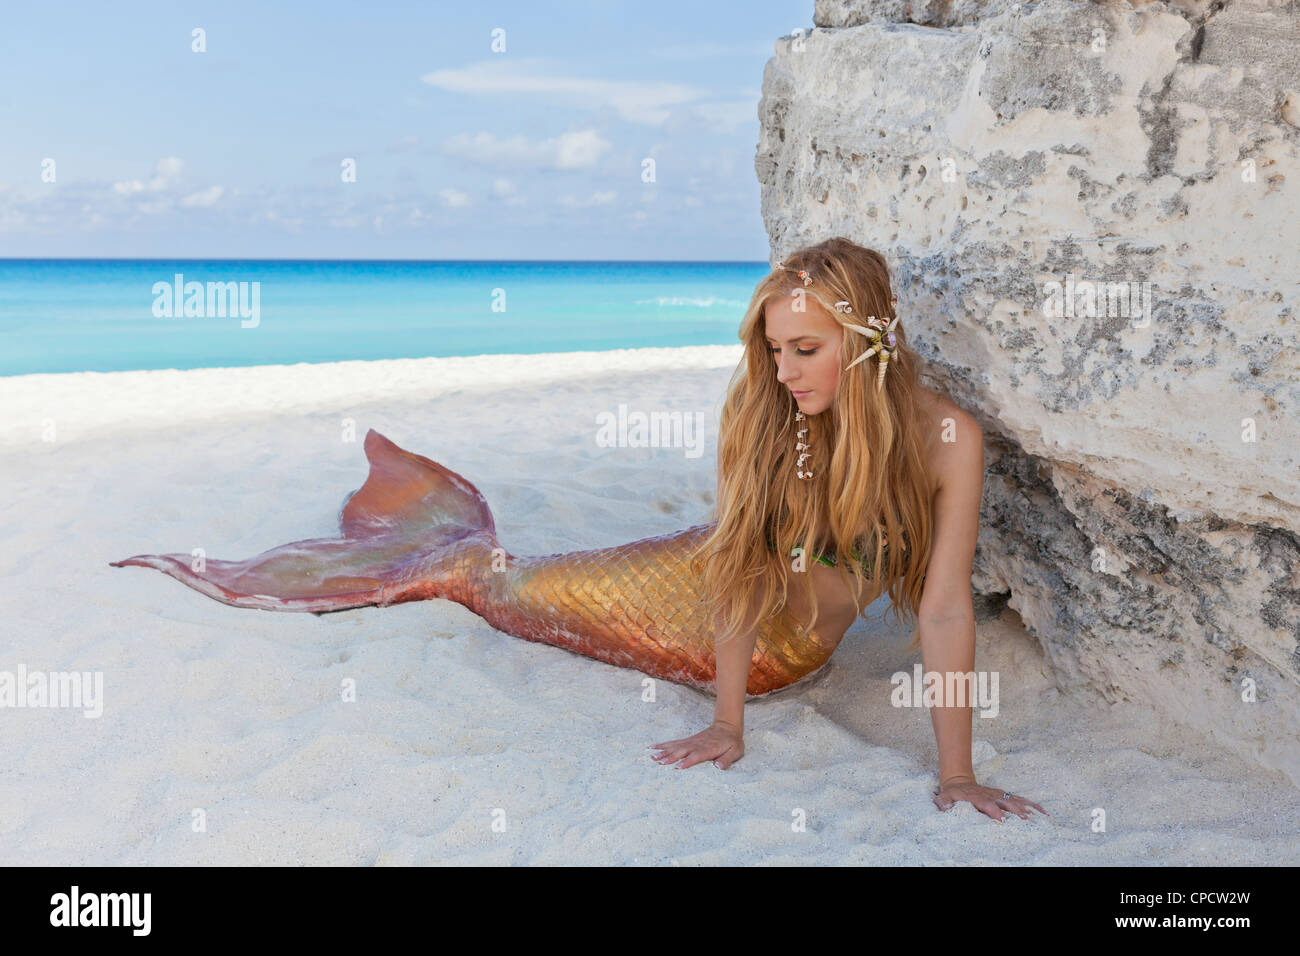 Junge blonde Meerjungfrau am Strand in Cancún, Mexiko Stockbild